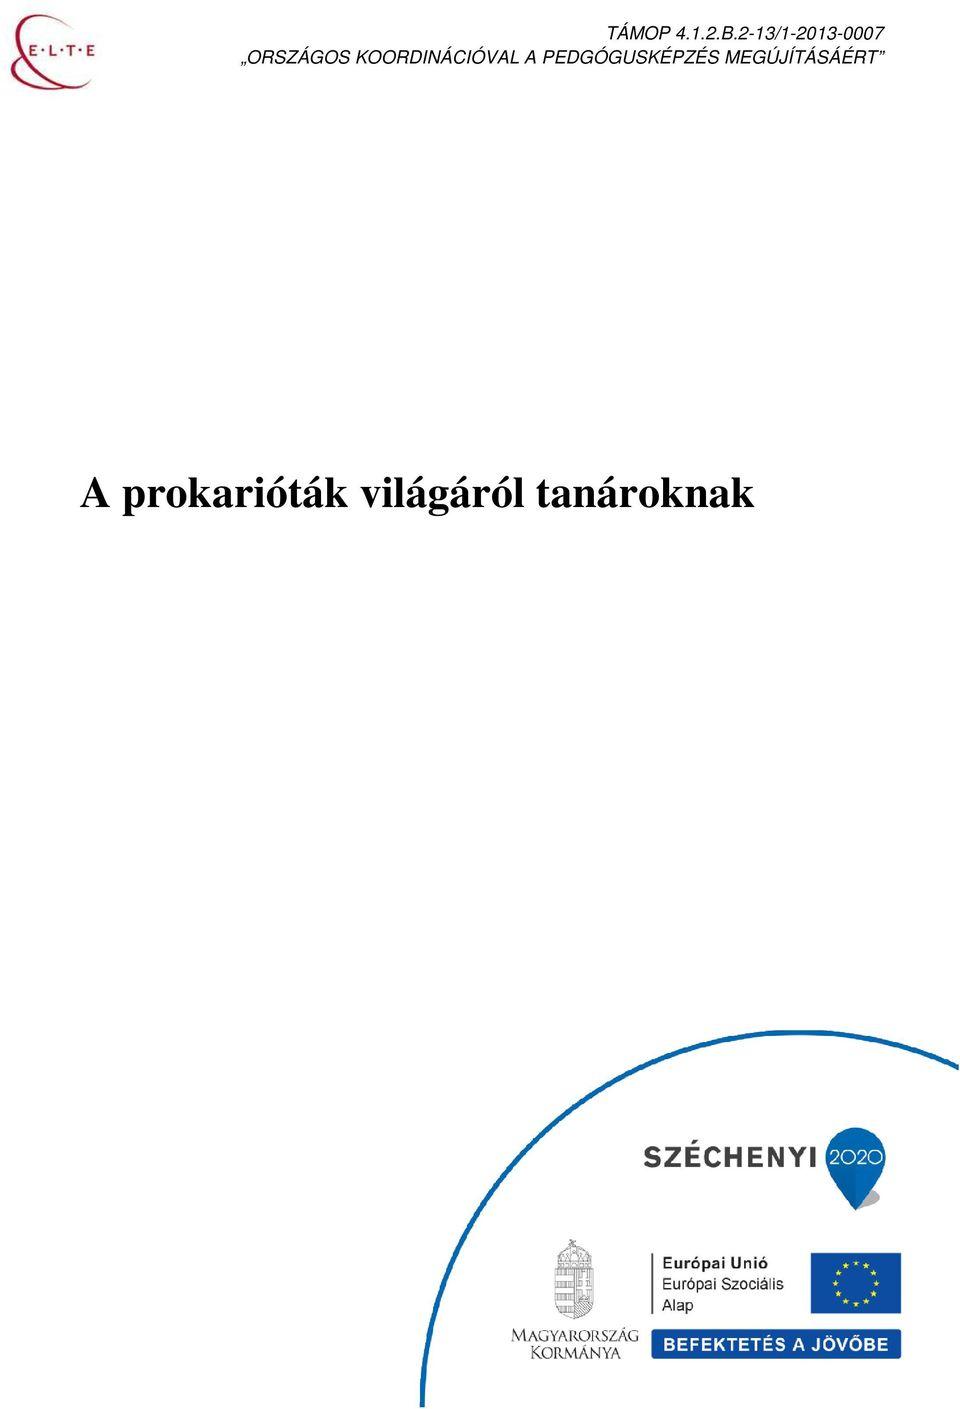 Phoronid - Phoronid - reproartinfo.hu